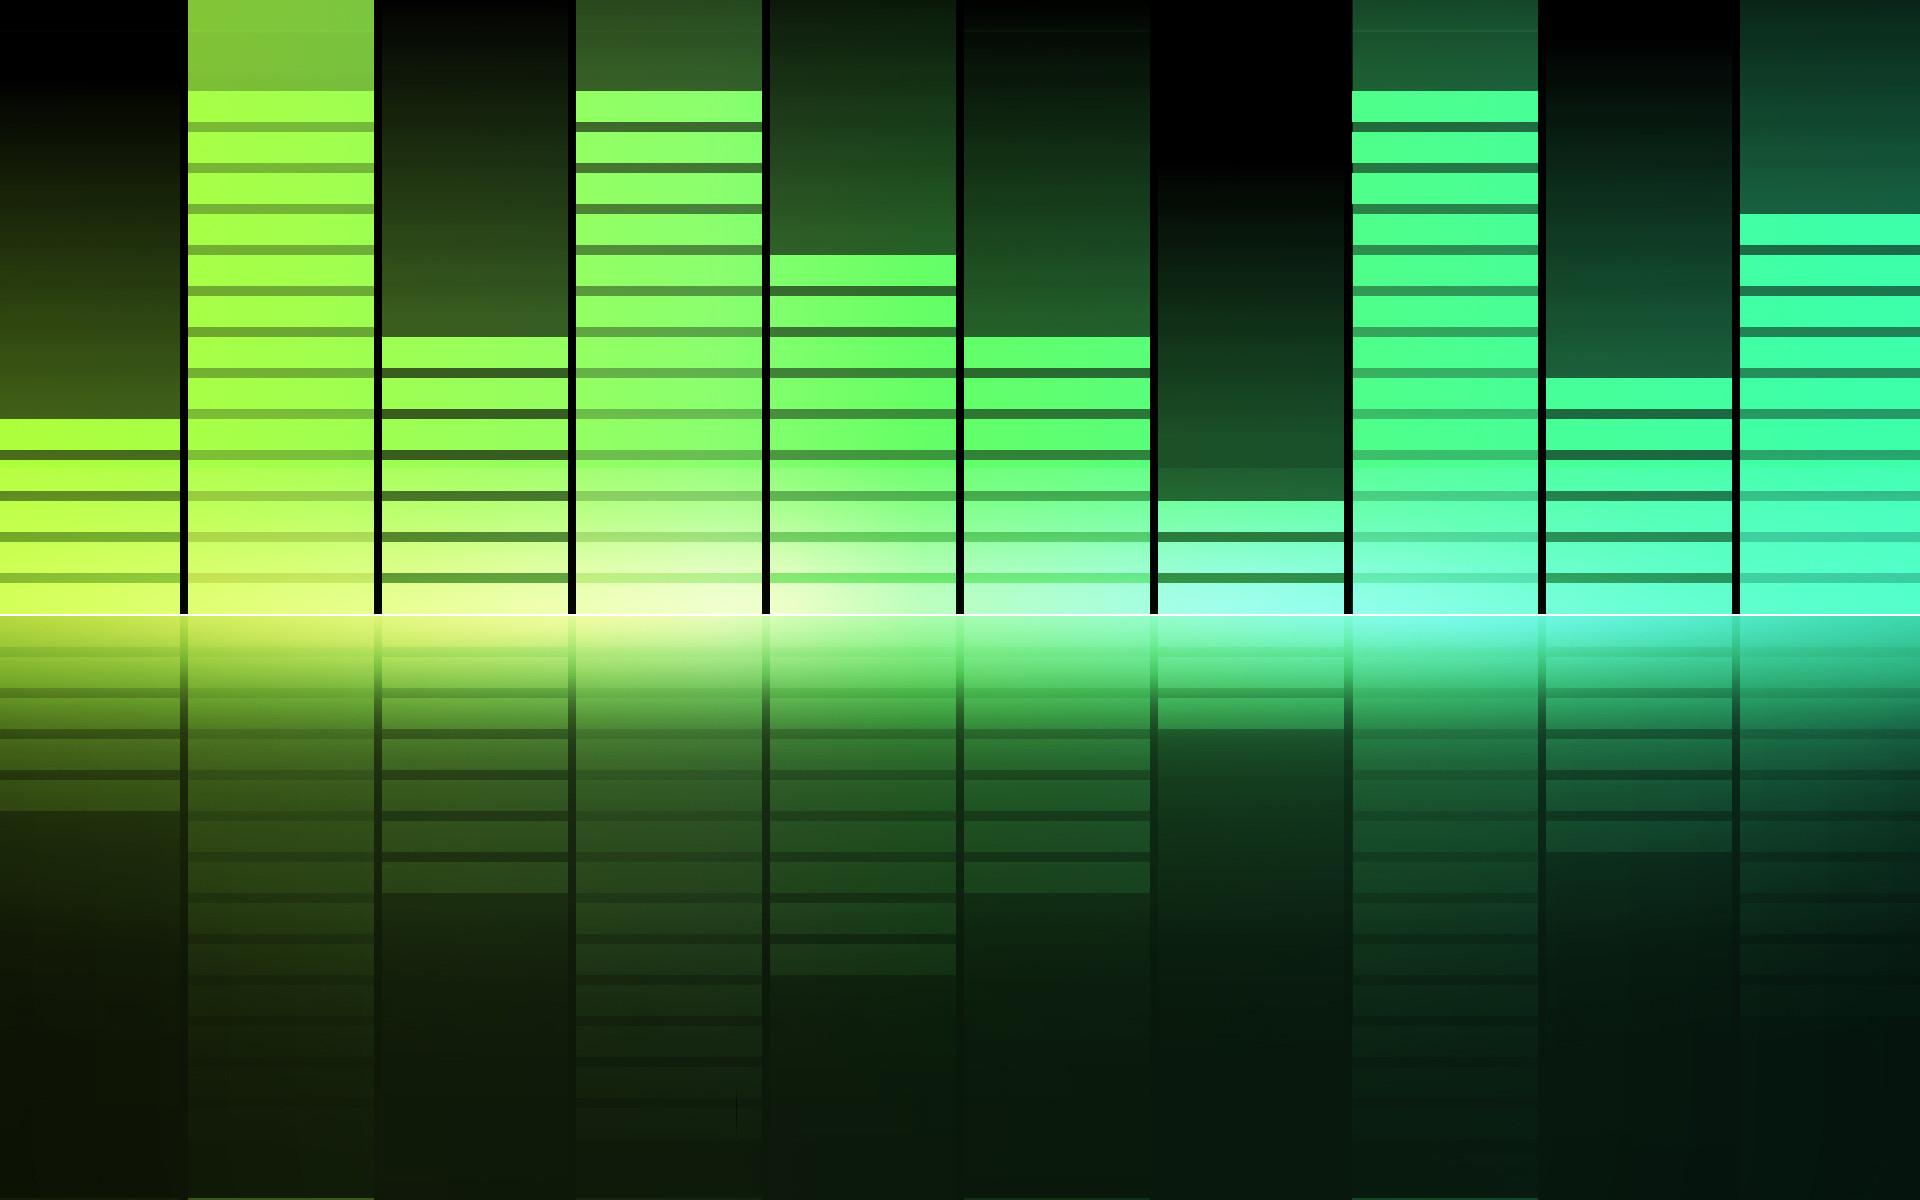 Music Bars Wallpaper (72+ images)